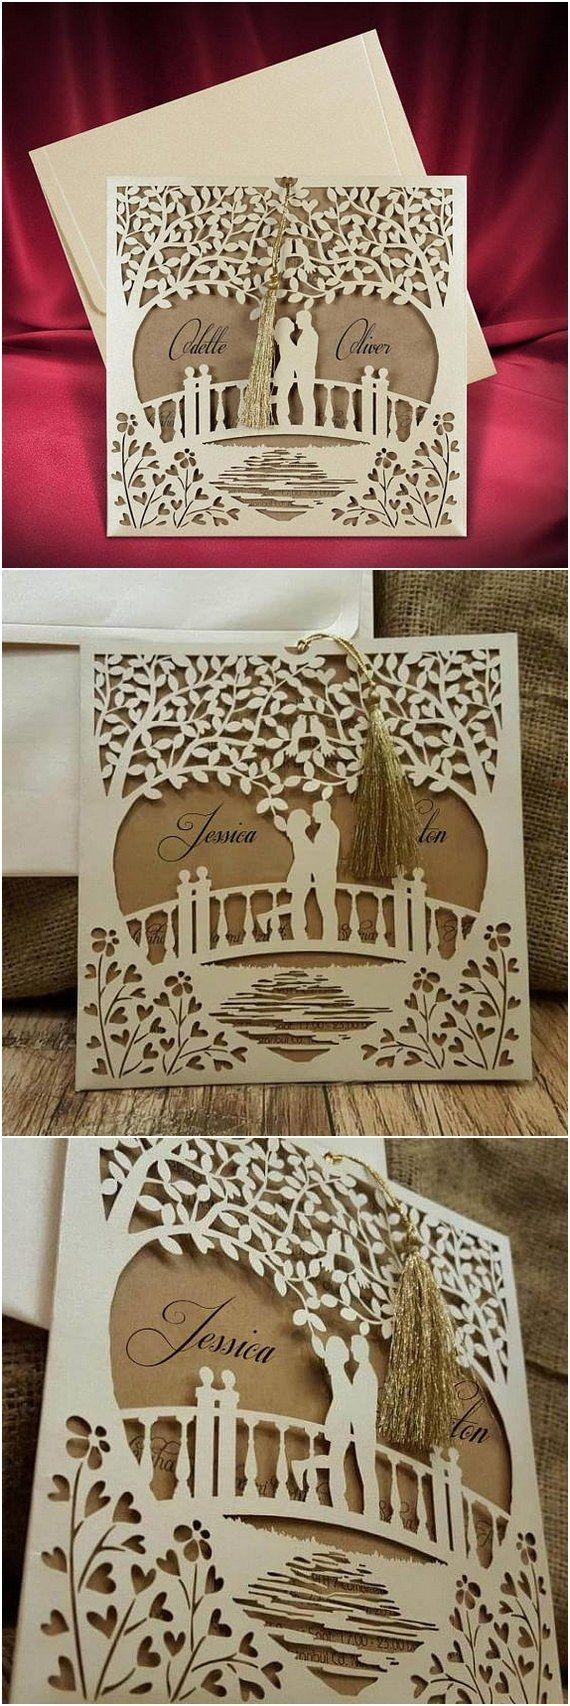 Romantic Laser Cut Wedding Invitation with Couple